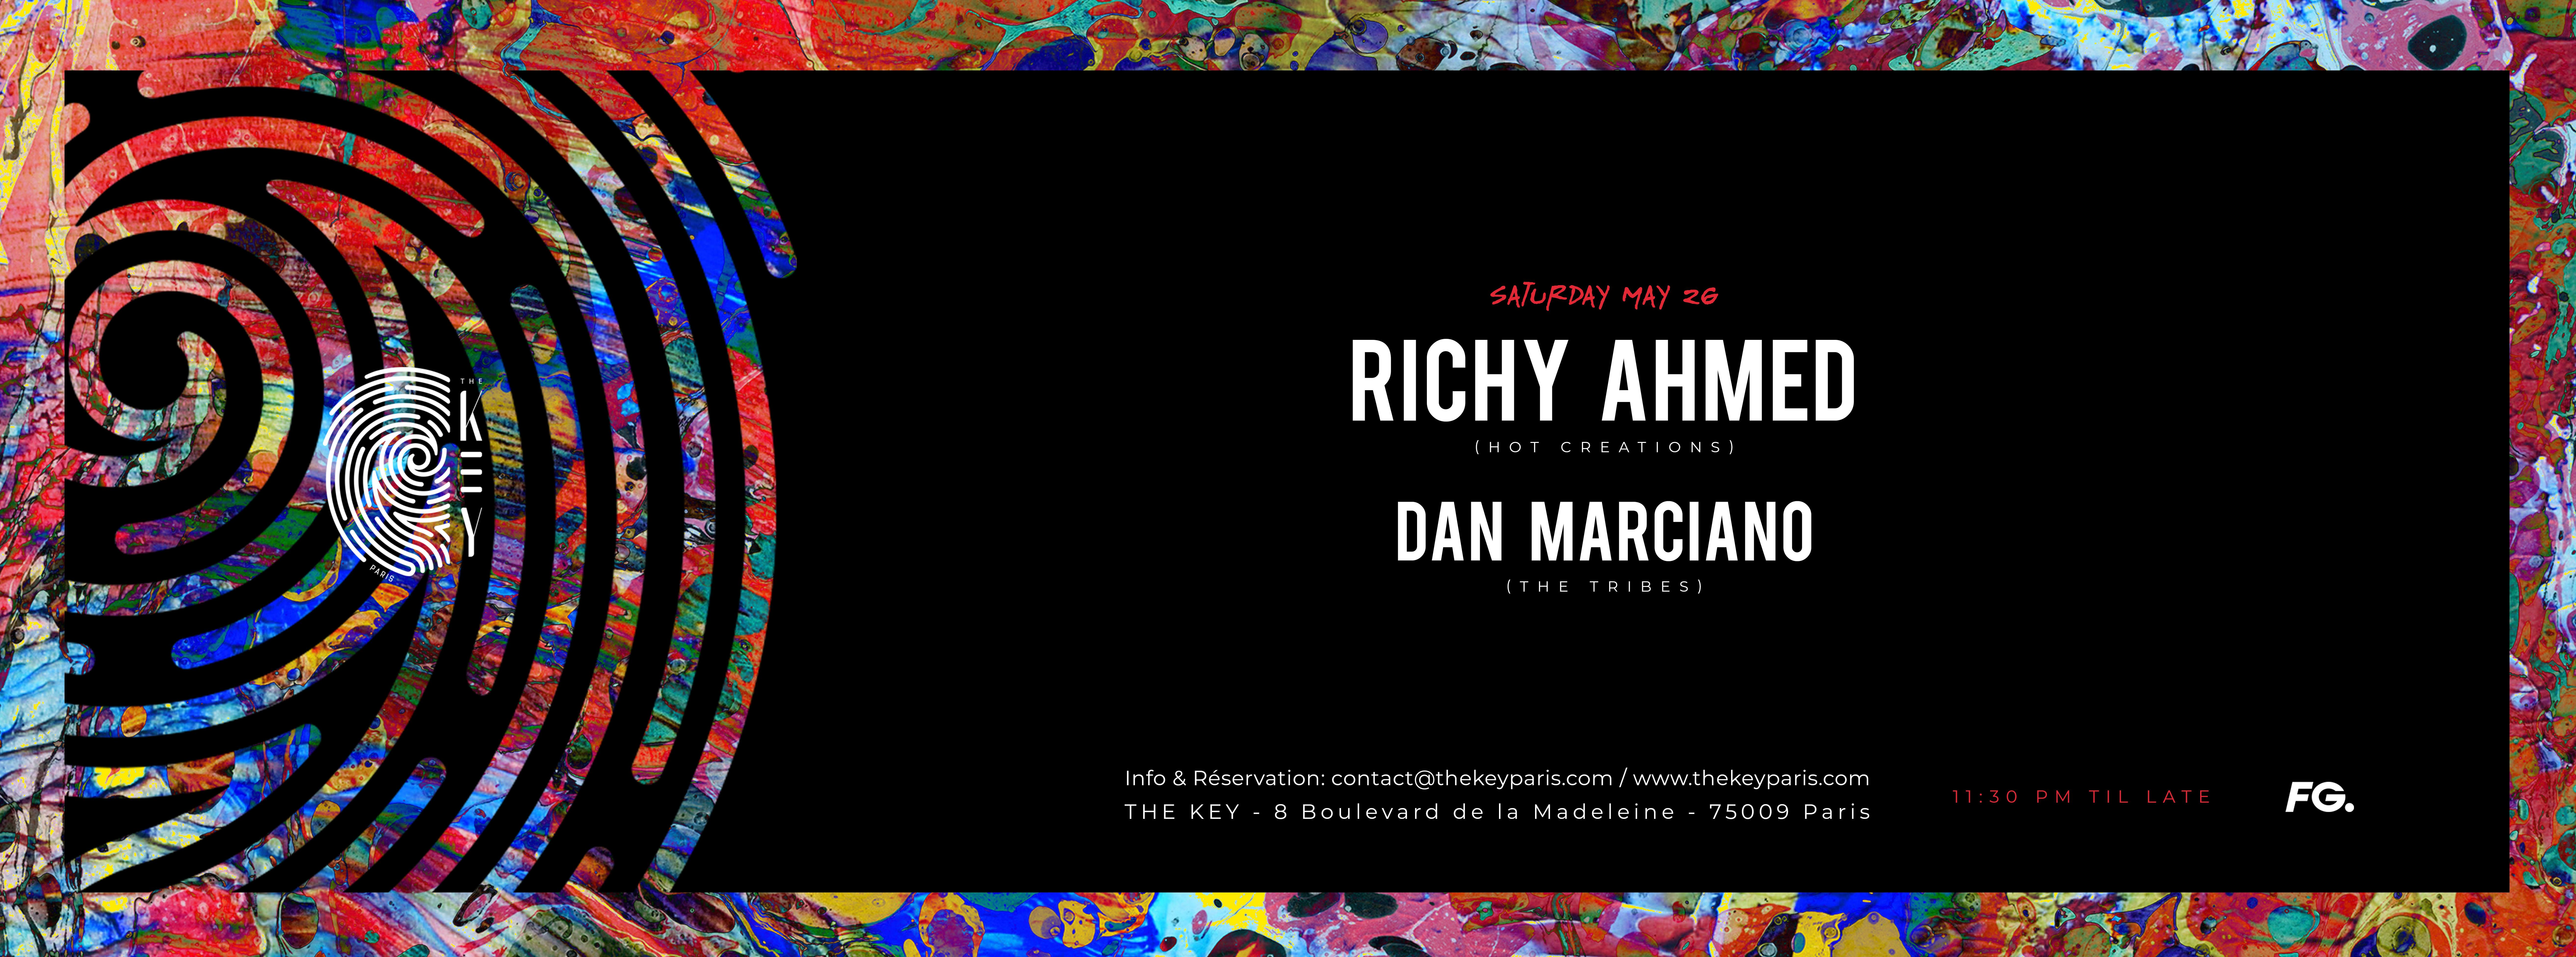 The Key Presents : Richy Ahmed, Dan Marciano